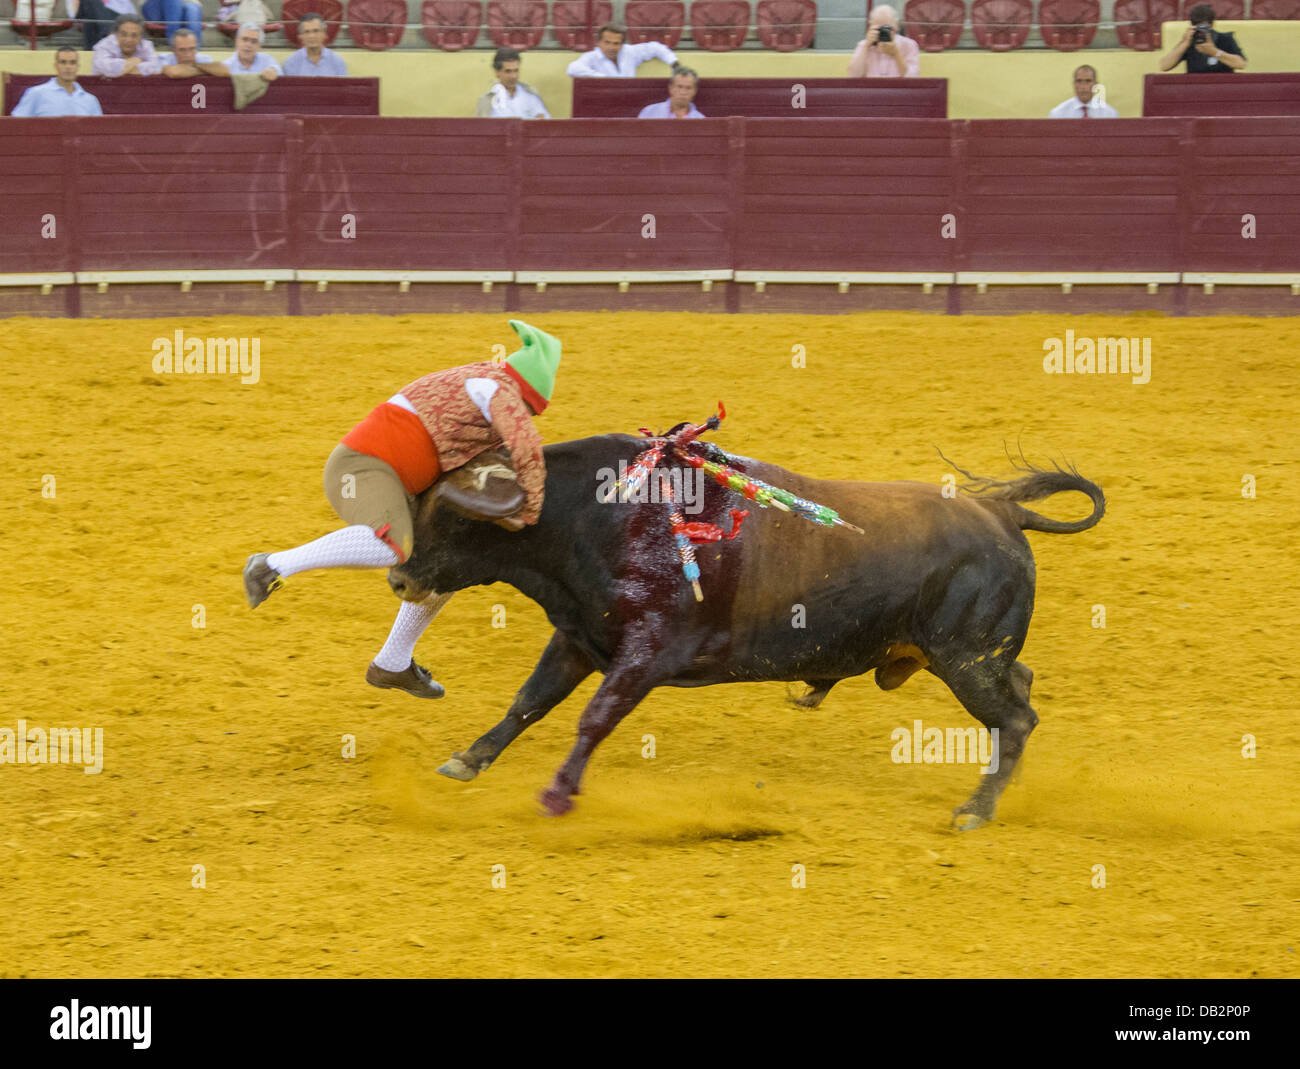 Bullfight at Campo Pequeno, Lisboa, Portugal. - Stock Image